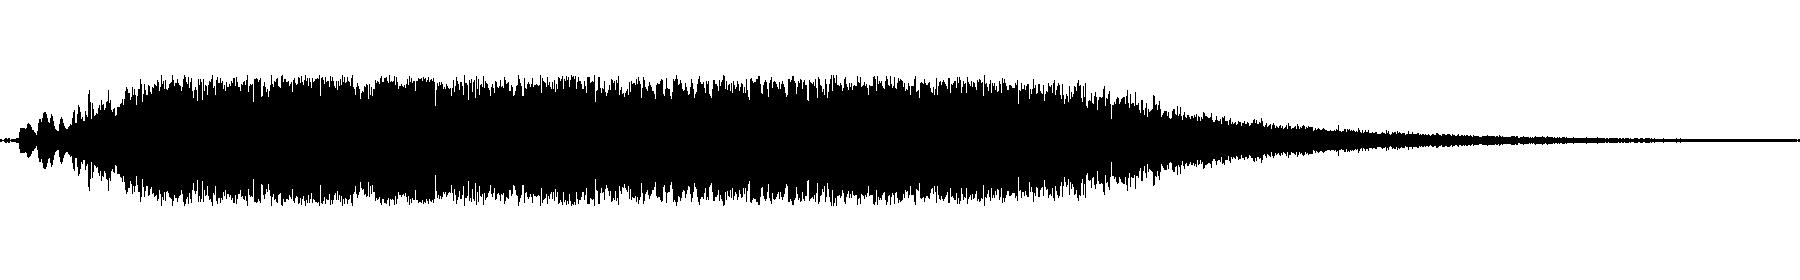 20170119 02 130bpm amin   spheres 003